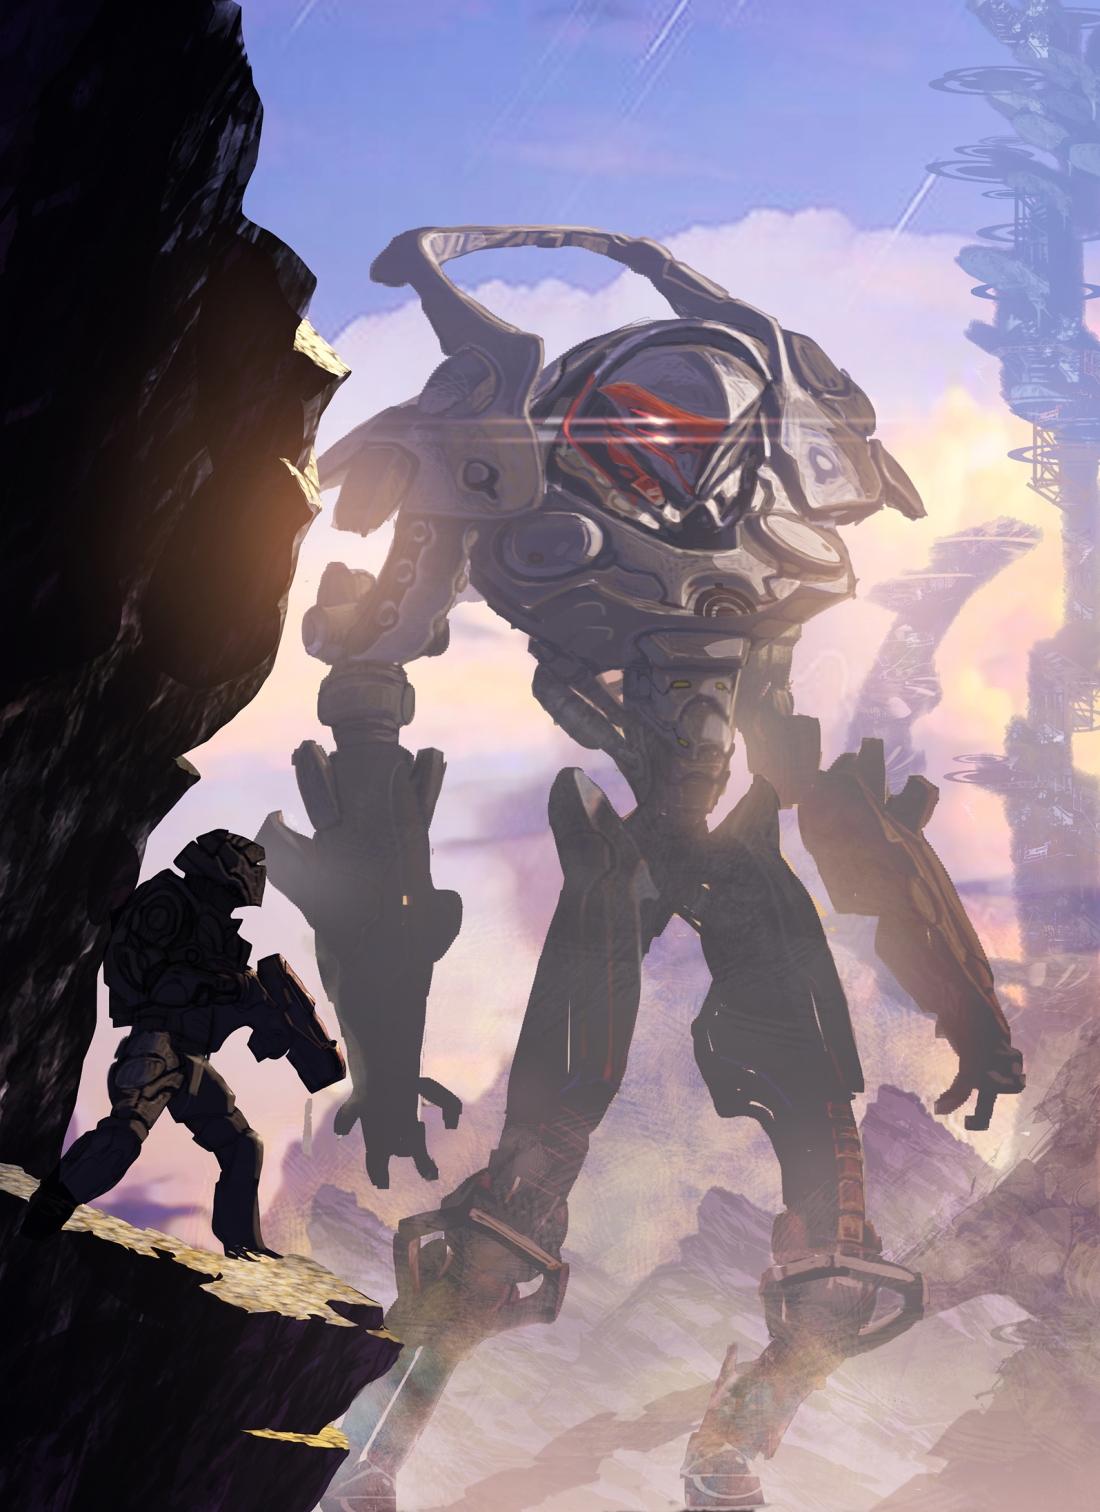 Gary_Freeman_Concept_art-Robot_sketch-10mb-2